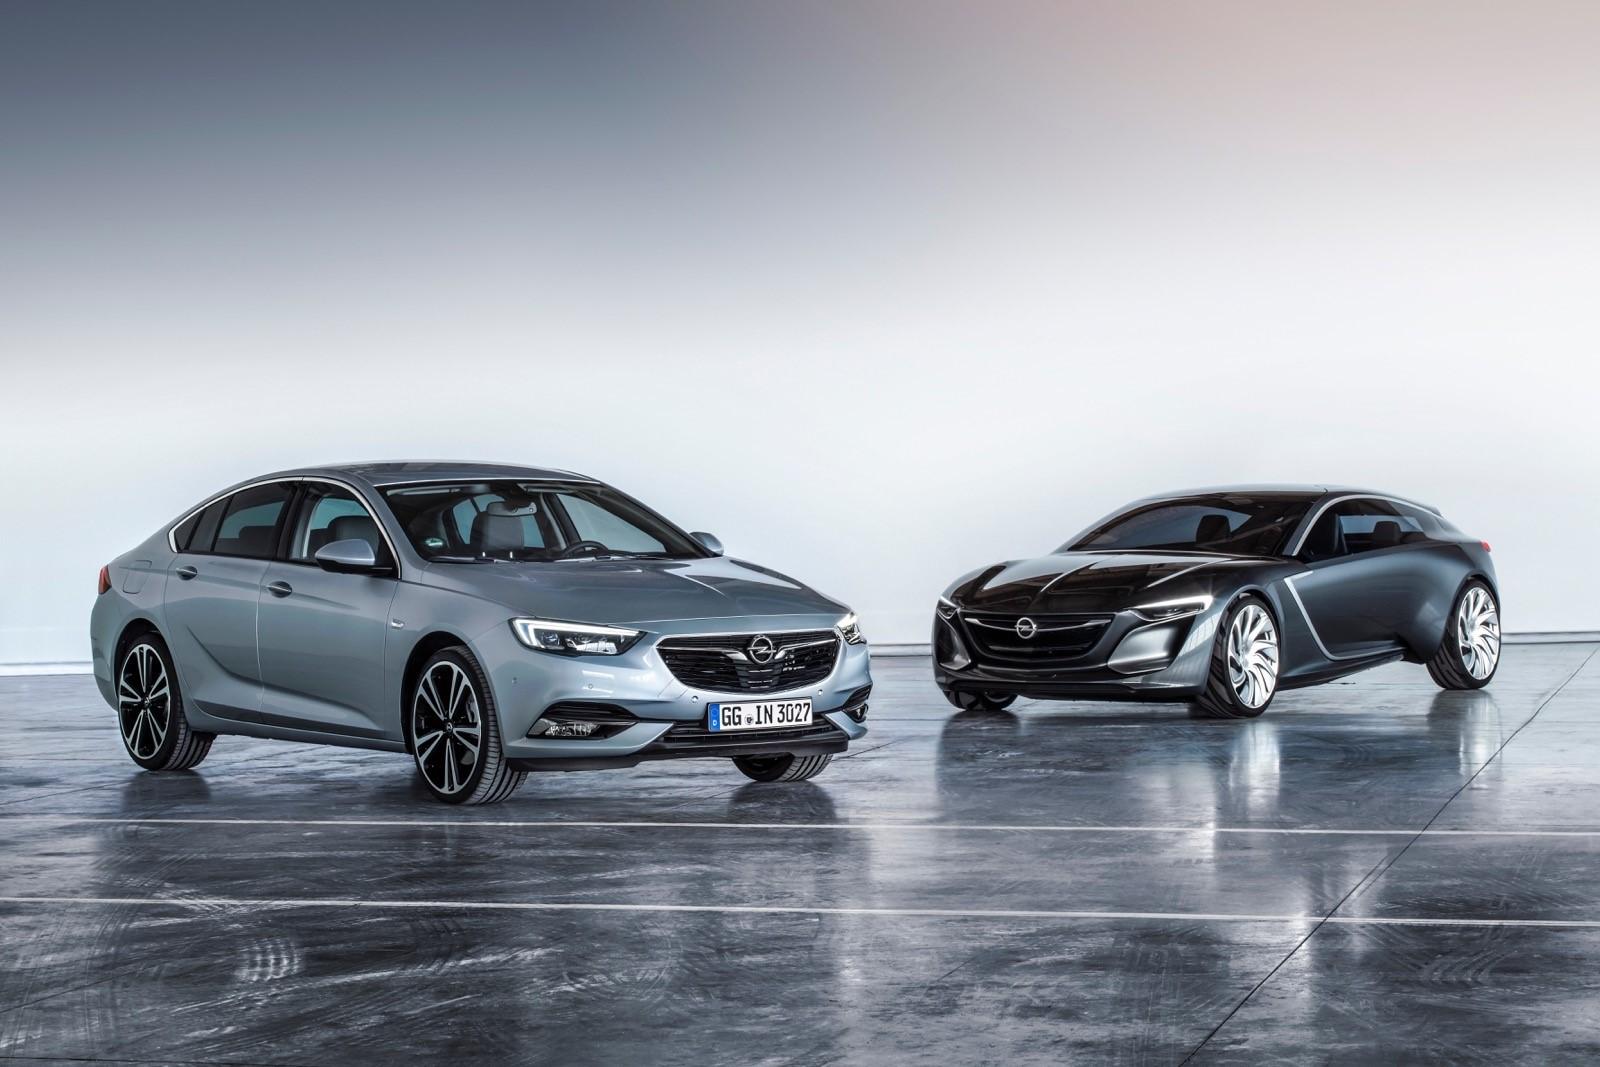 Opel Insignia Grand Sport & Opel Monza Concept